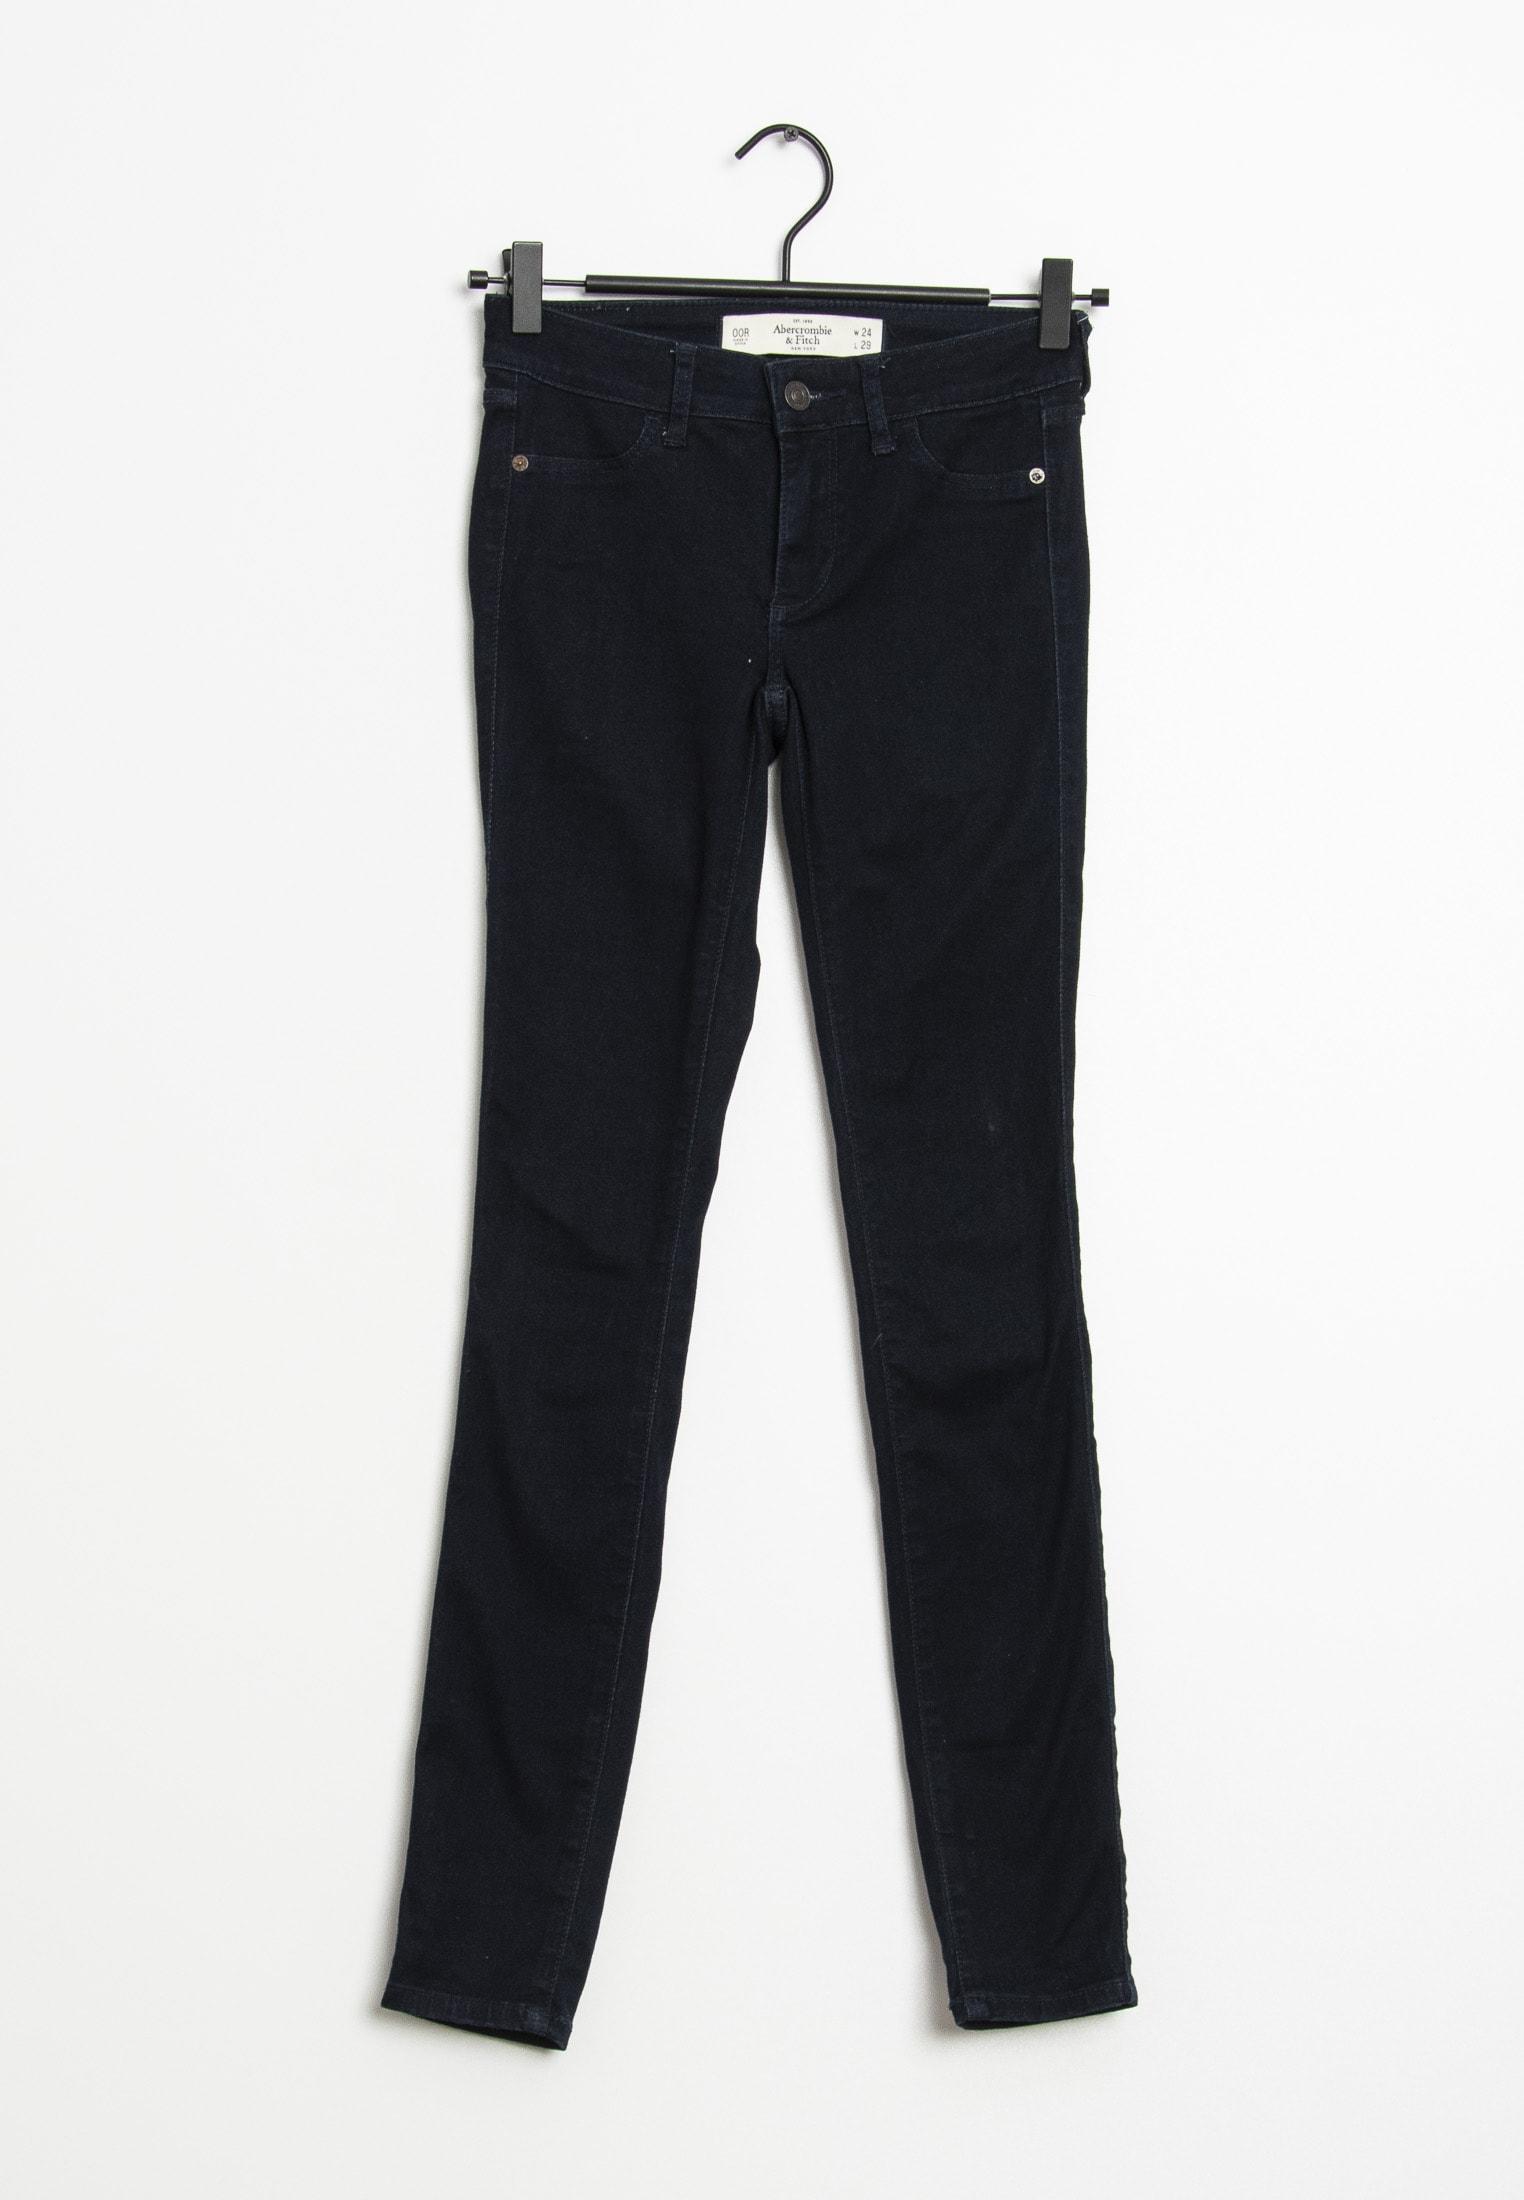 Abercrombie & Fitch Jeans Blau Gr.W24 L29